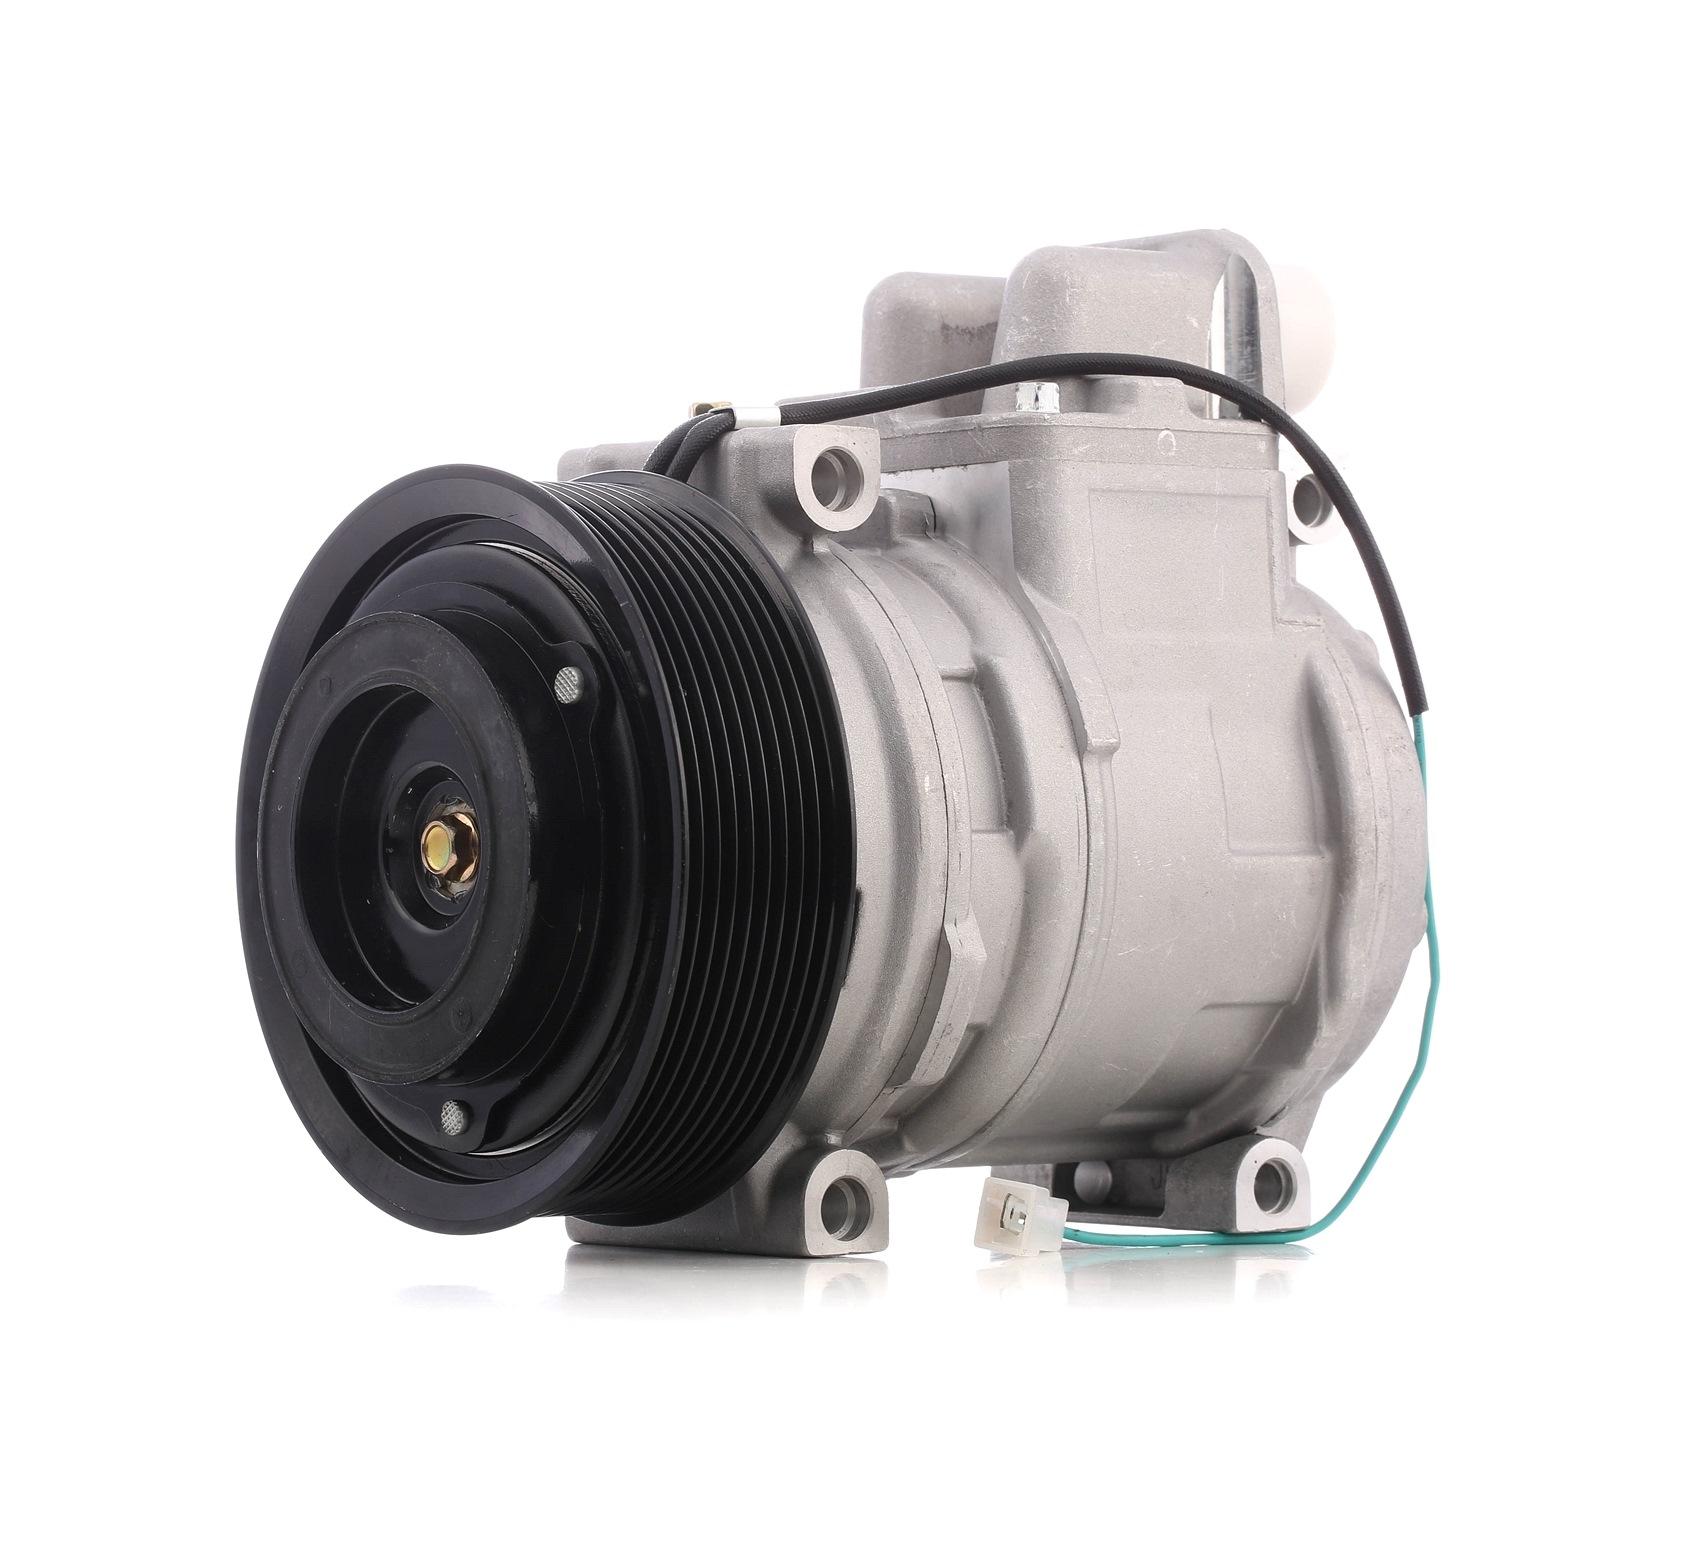 Original MERCEDES-BENZ Kompressor Klimaanlage 447K0283